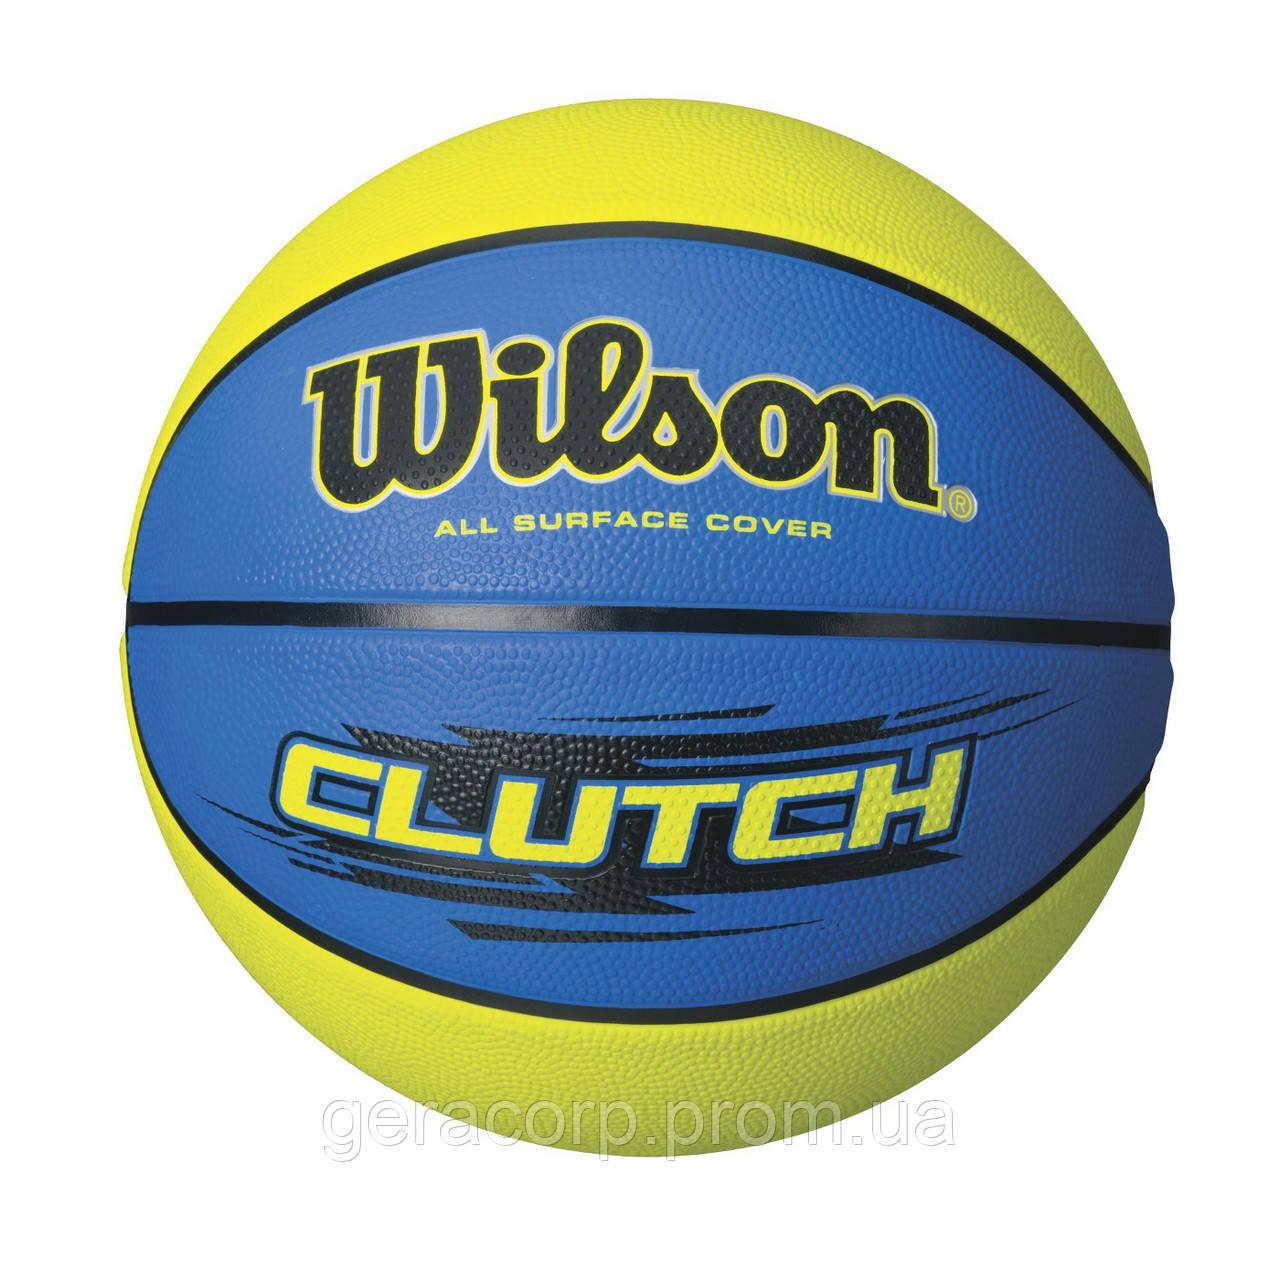 Мяч баскетбольный Wilson Clutch Yellow/Blue